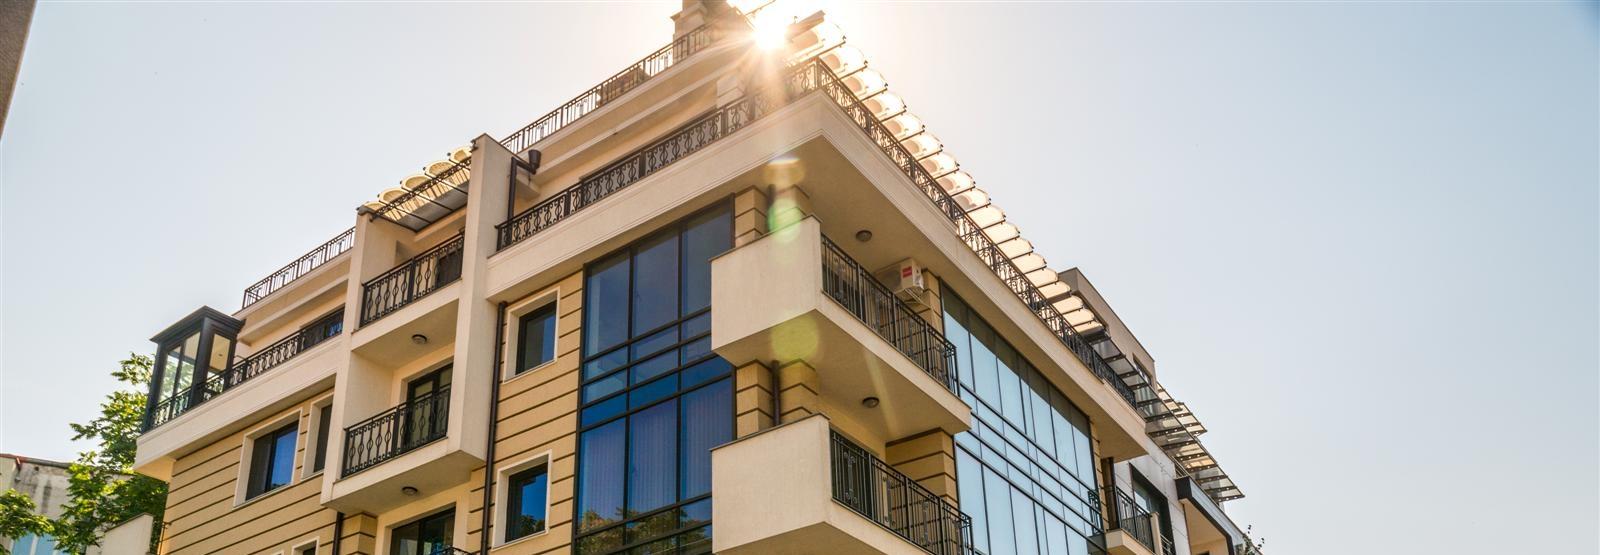 качествено строителство в Бургас